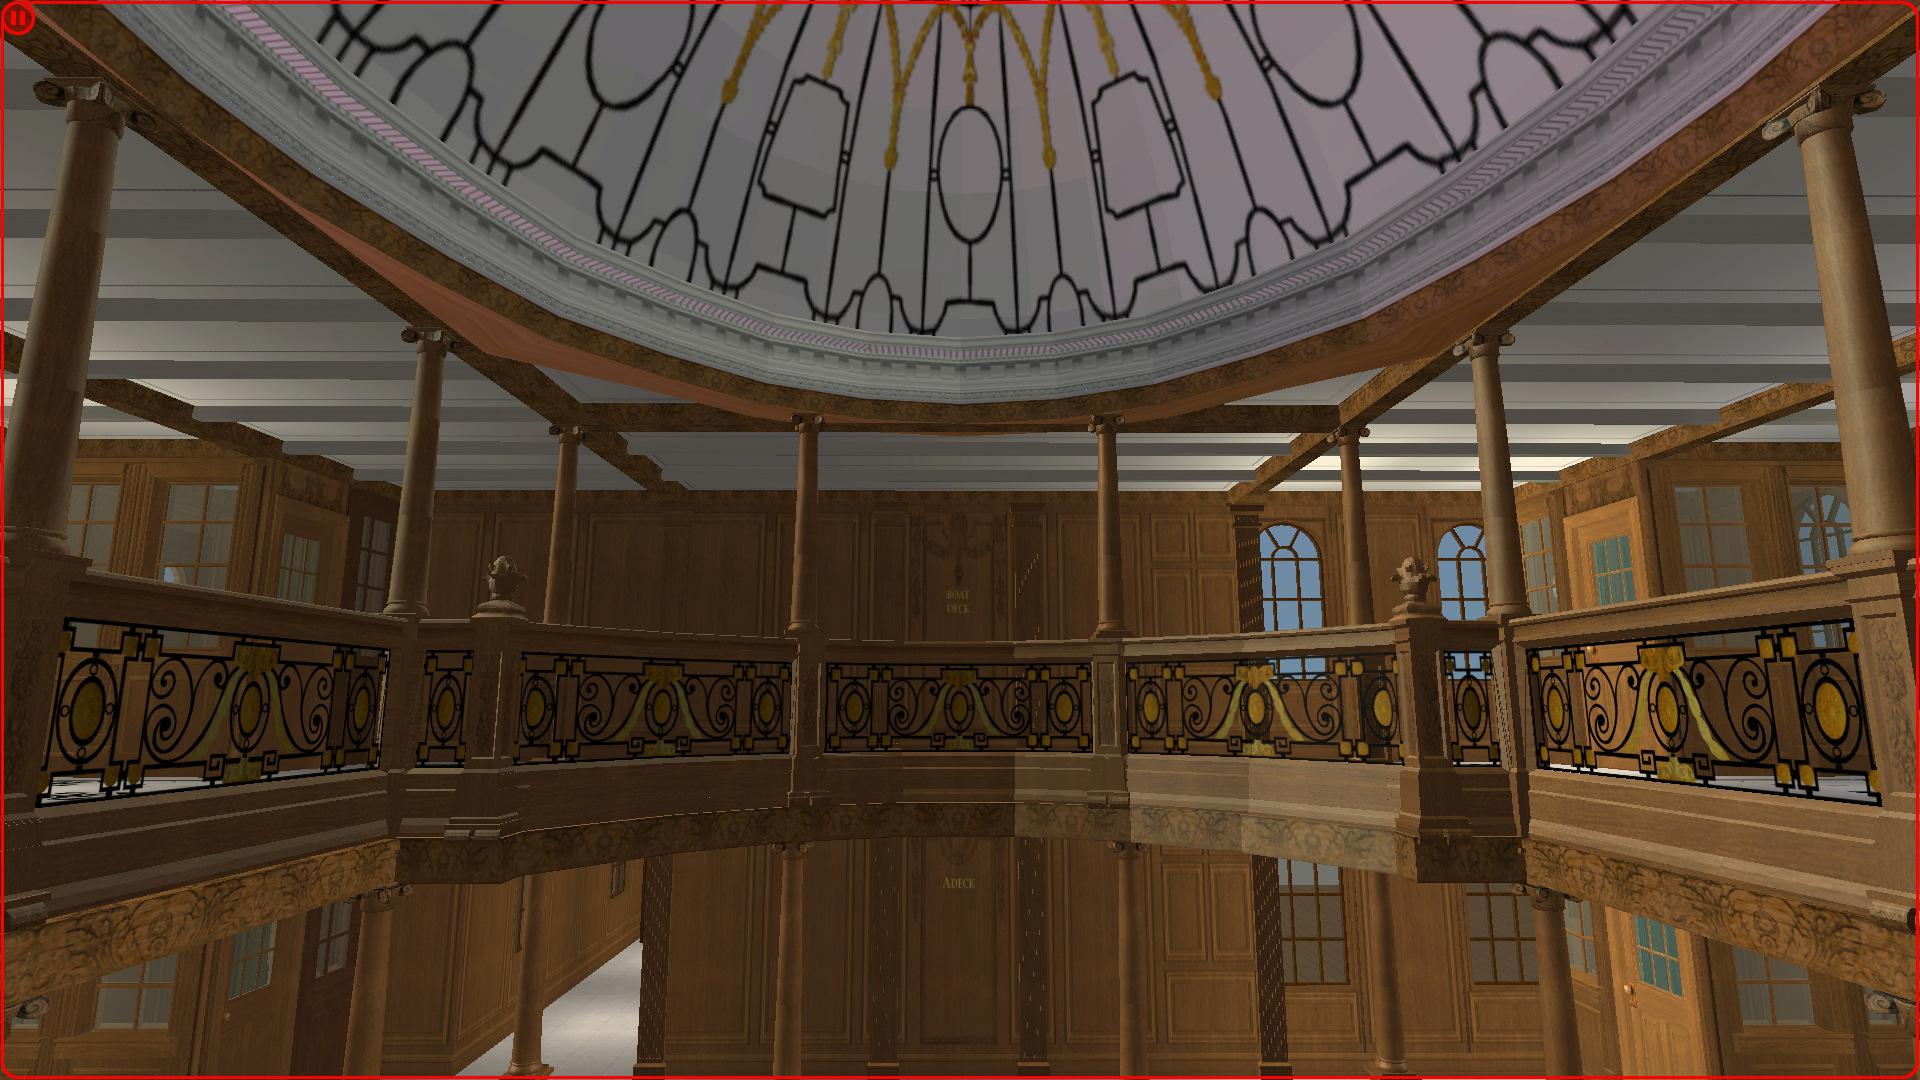 The Sims 2 Titanic Sims2e60